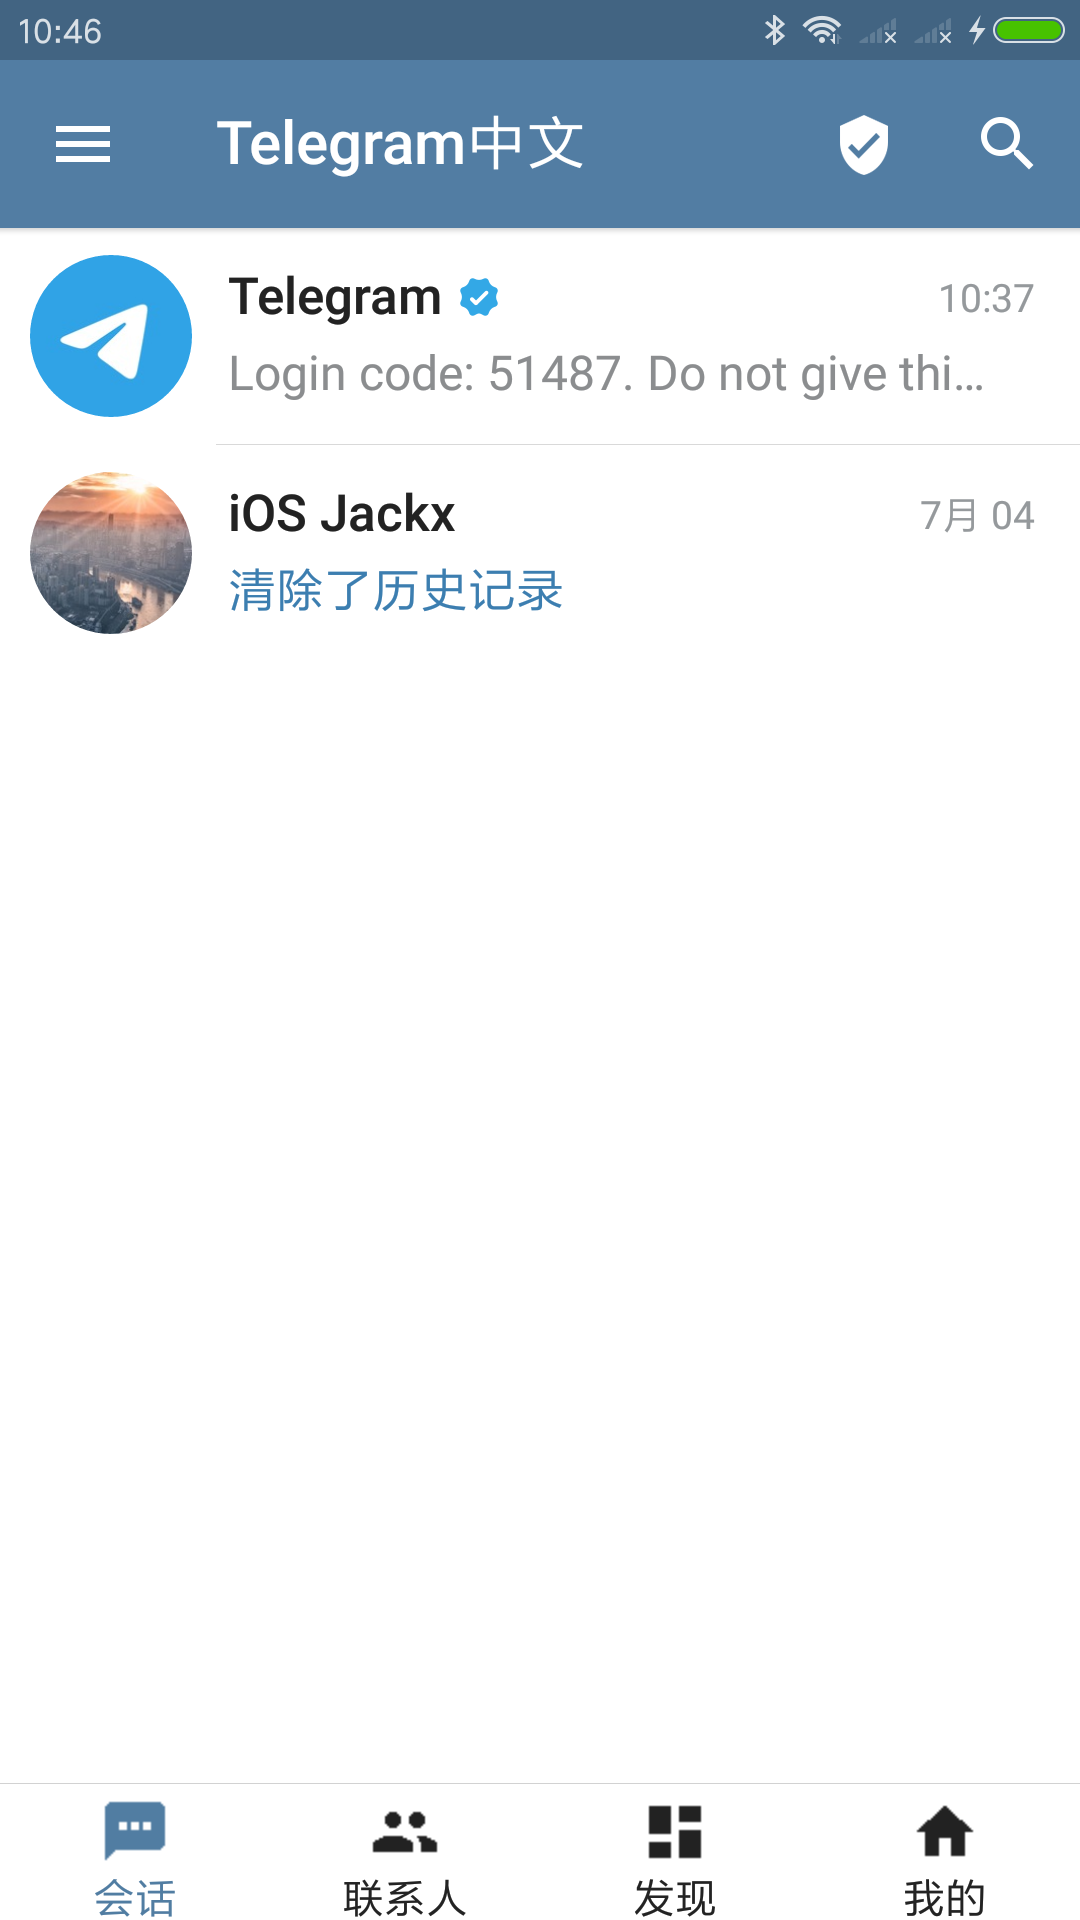 telegram 安卓中文版手机软件app截图